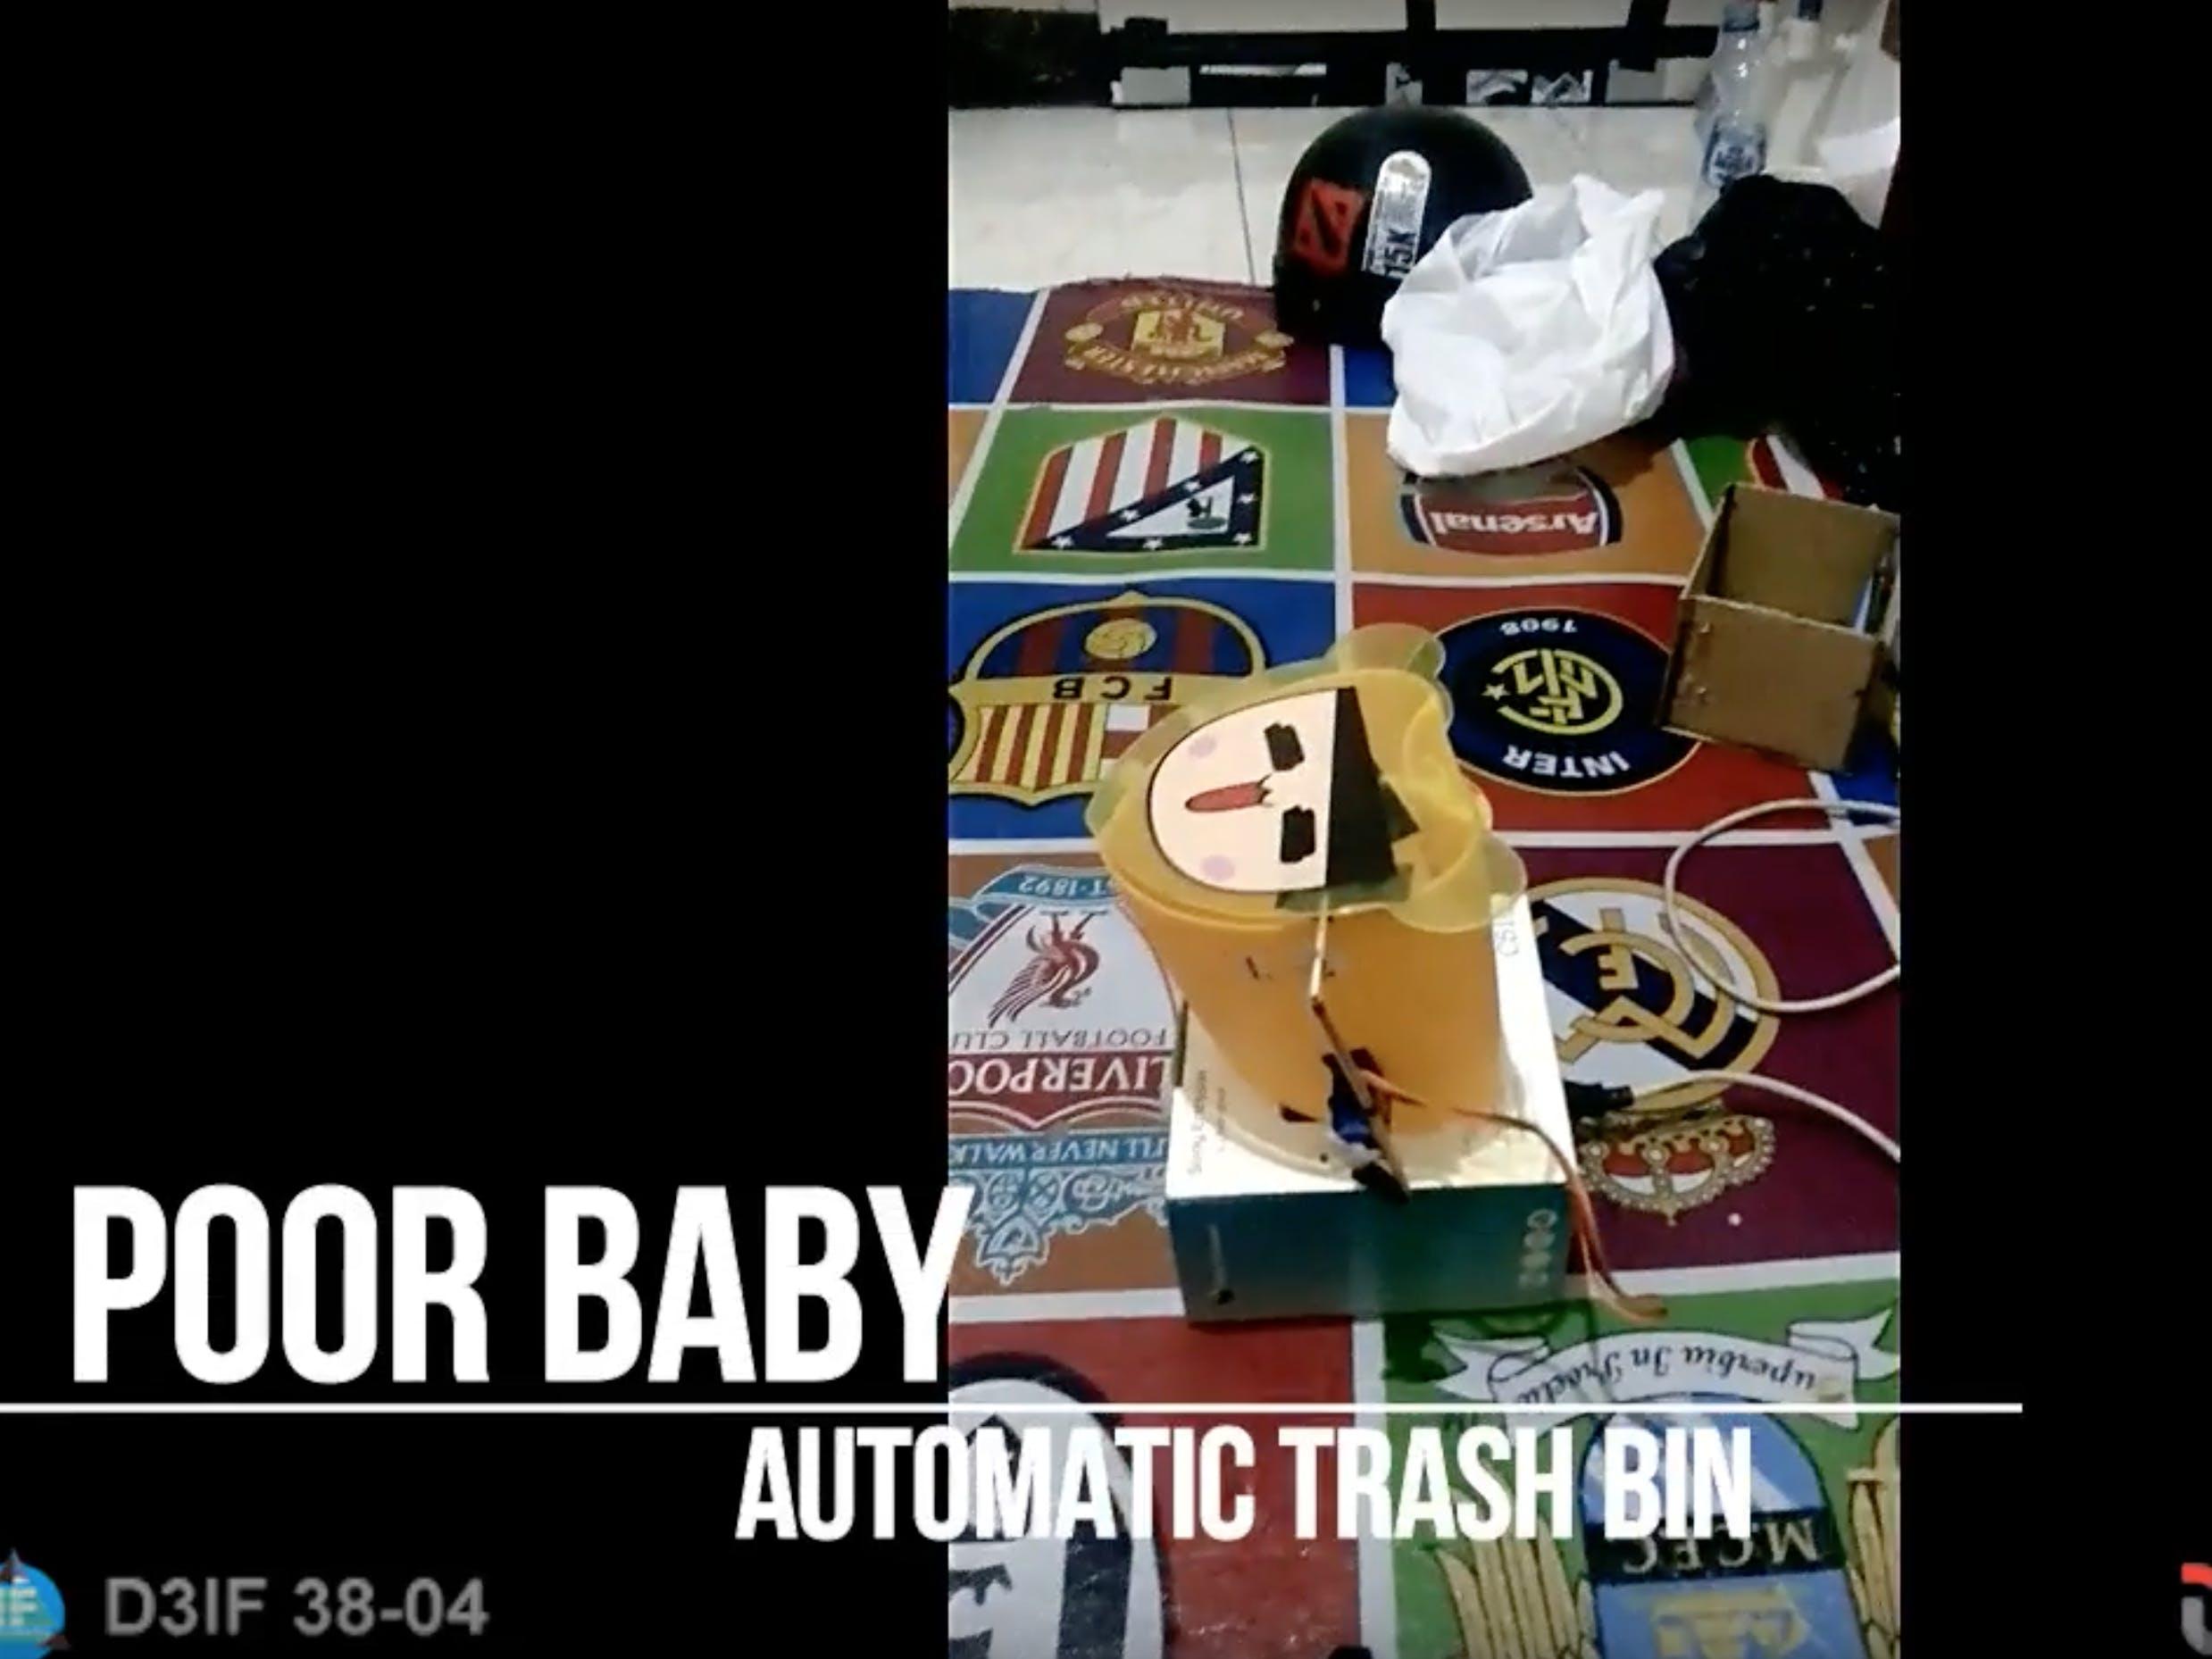 Automatic Trash Bin